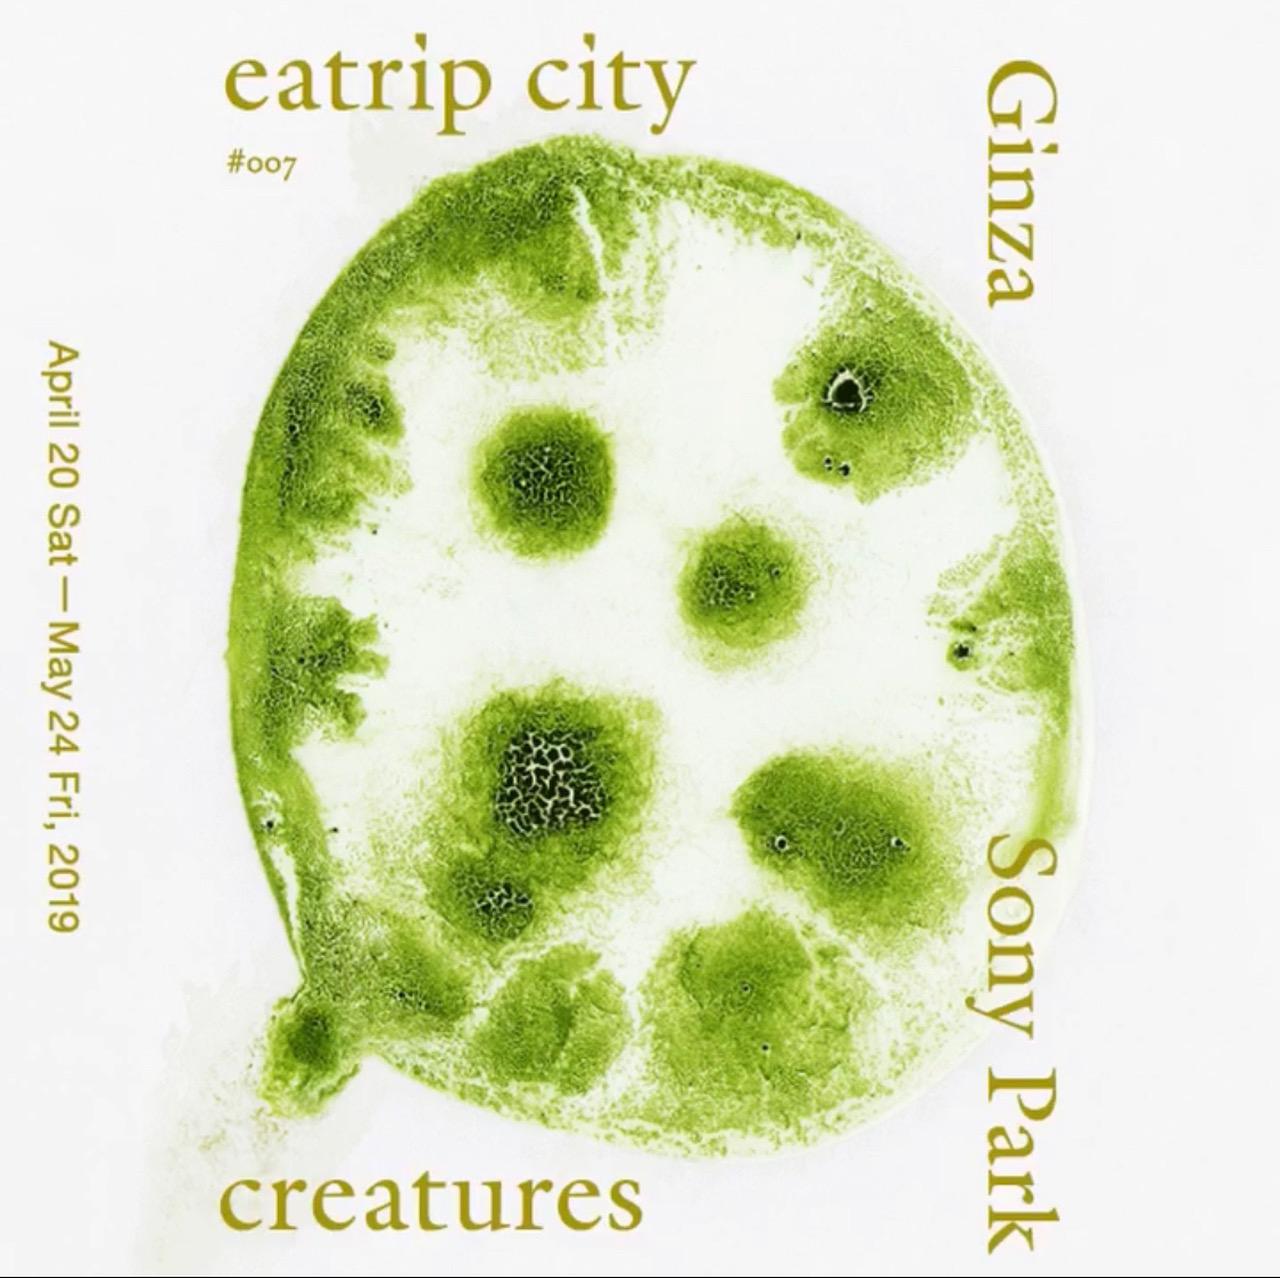 eatrip city creatures